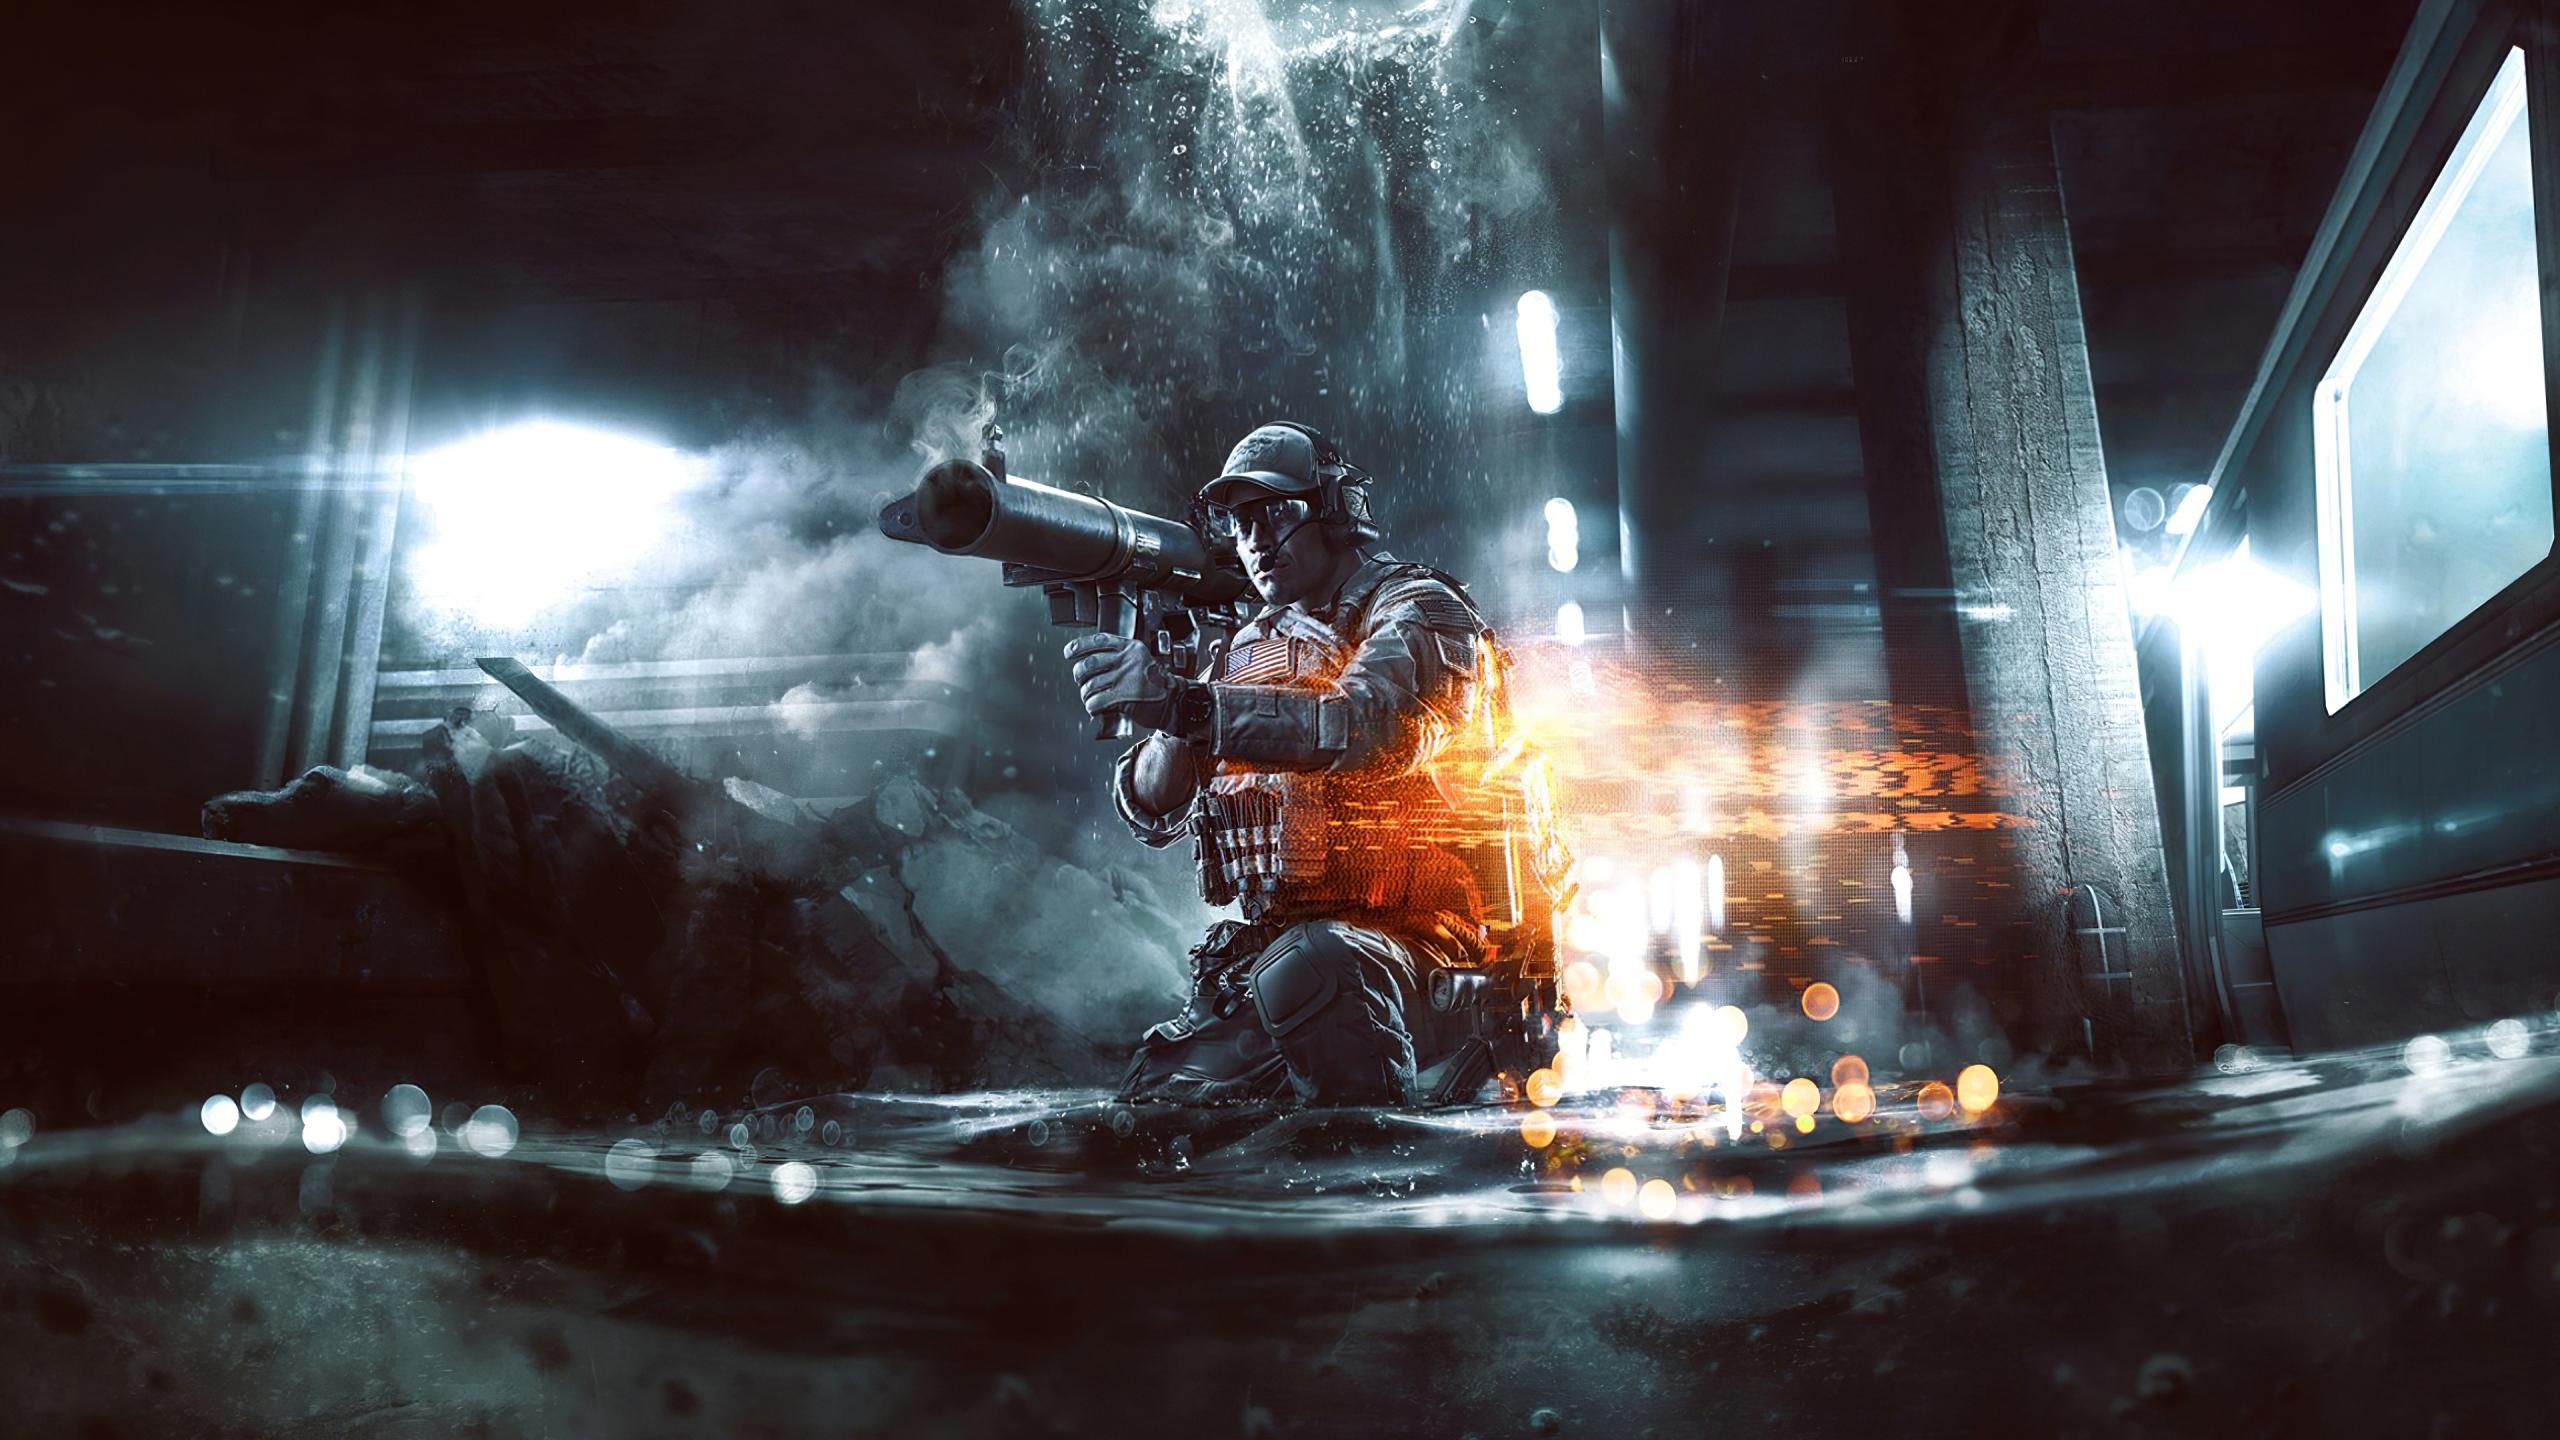 2560x1440 4k Battlefield 4 2019 1440p Resolution Wallpaper Hd